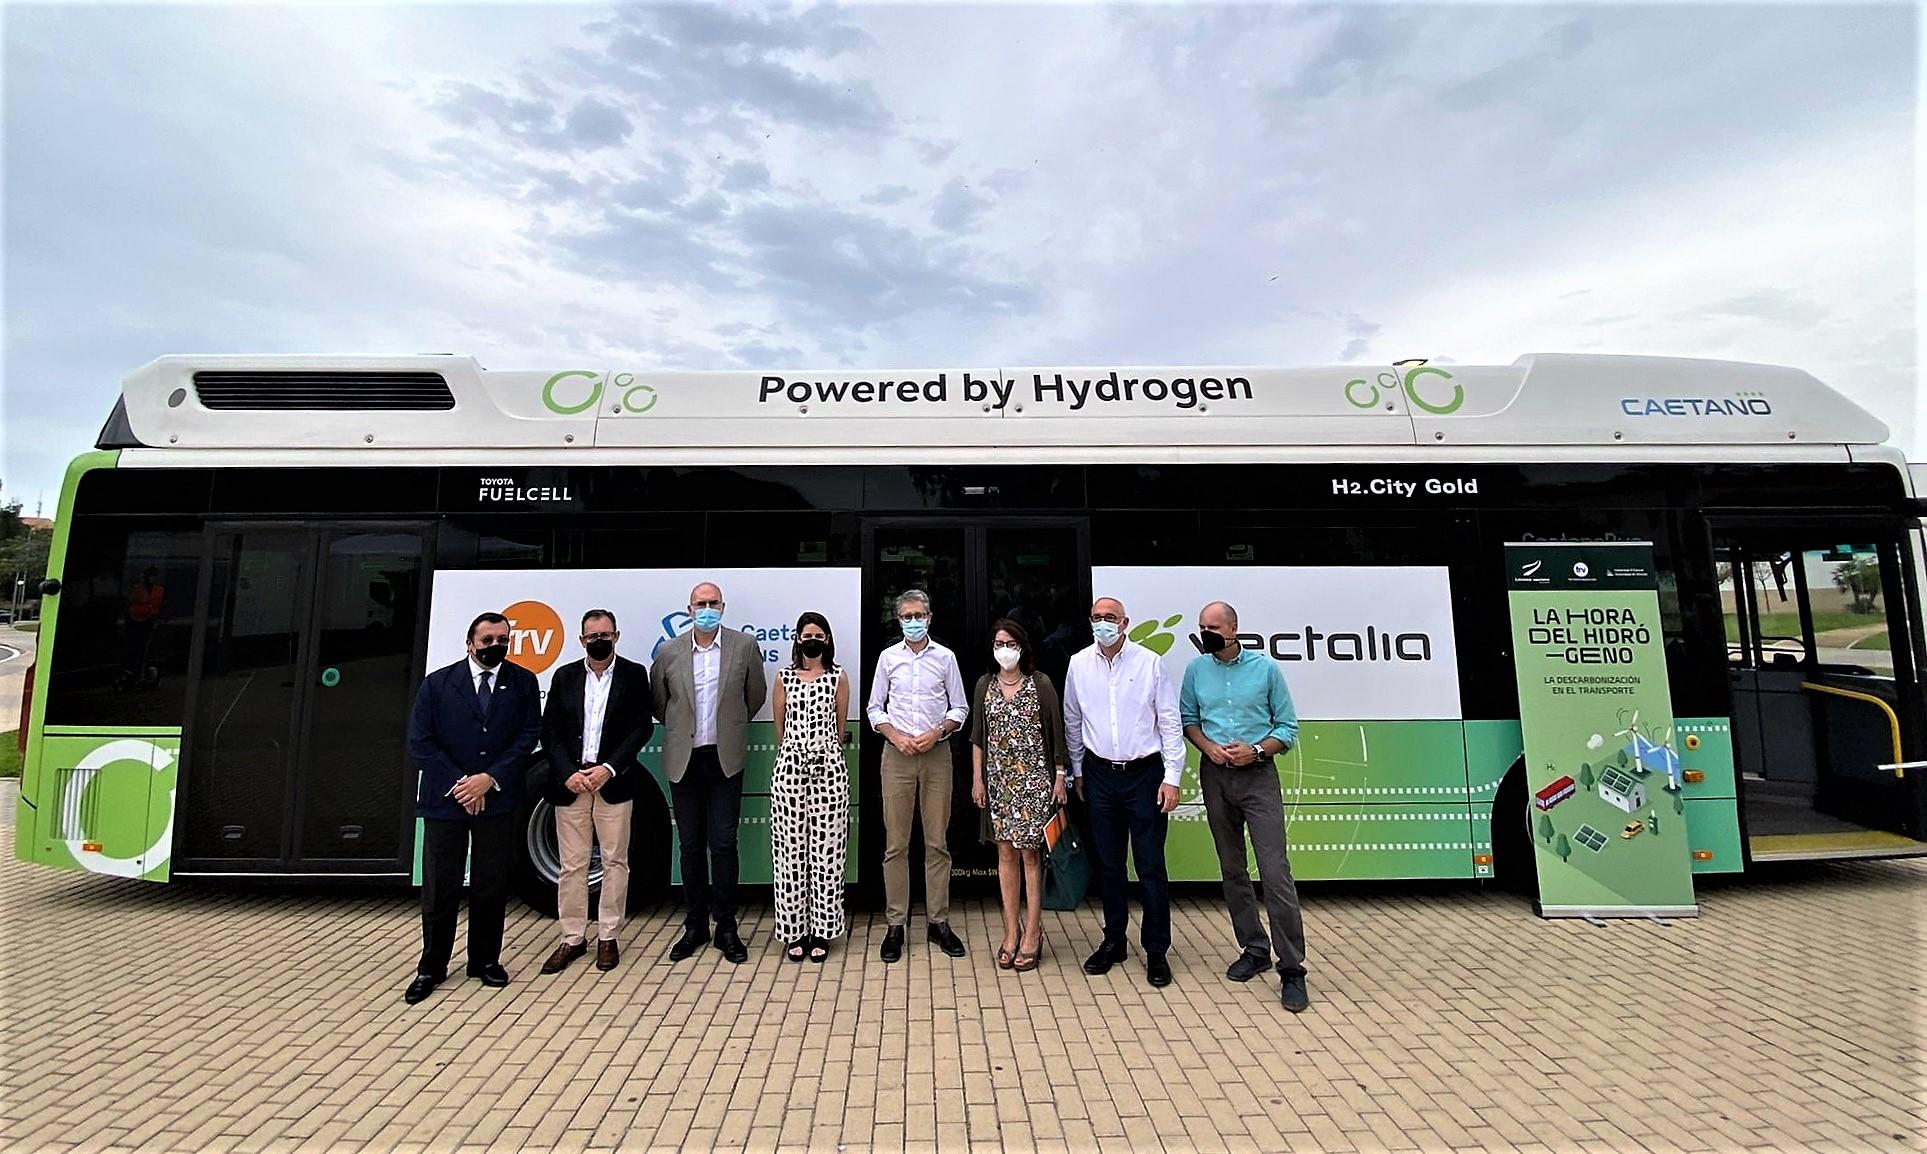 FRV Vectalia HyVus Bus, Alicante